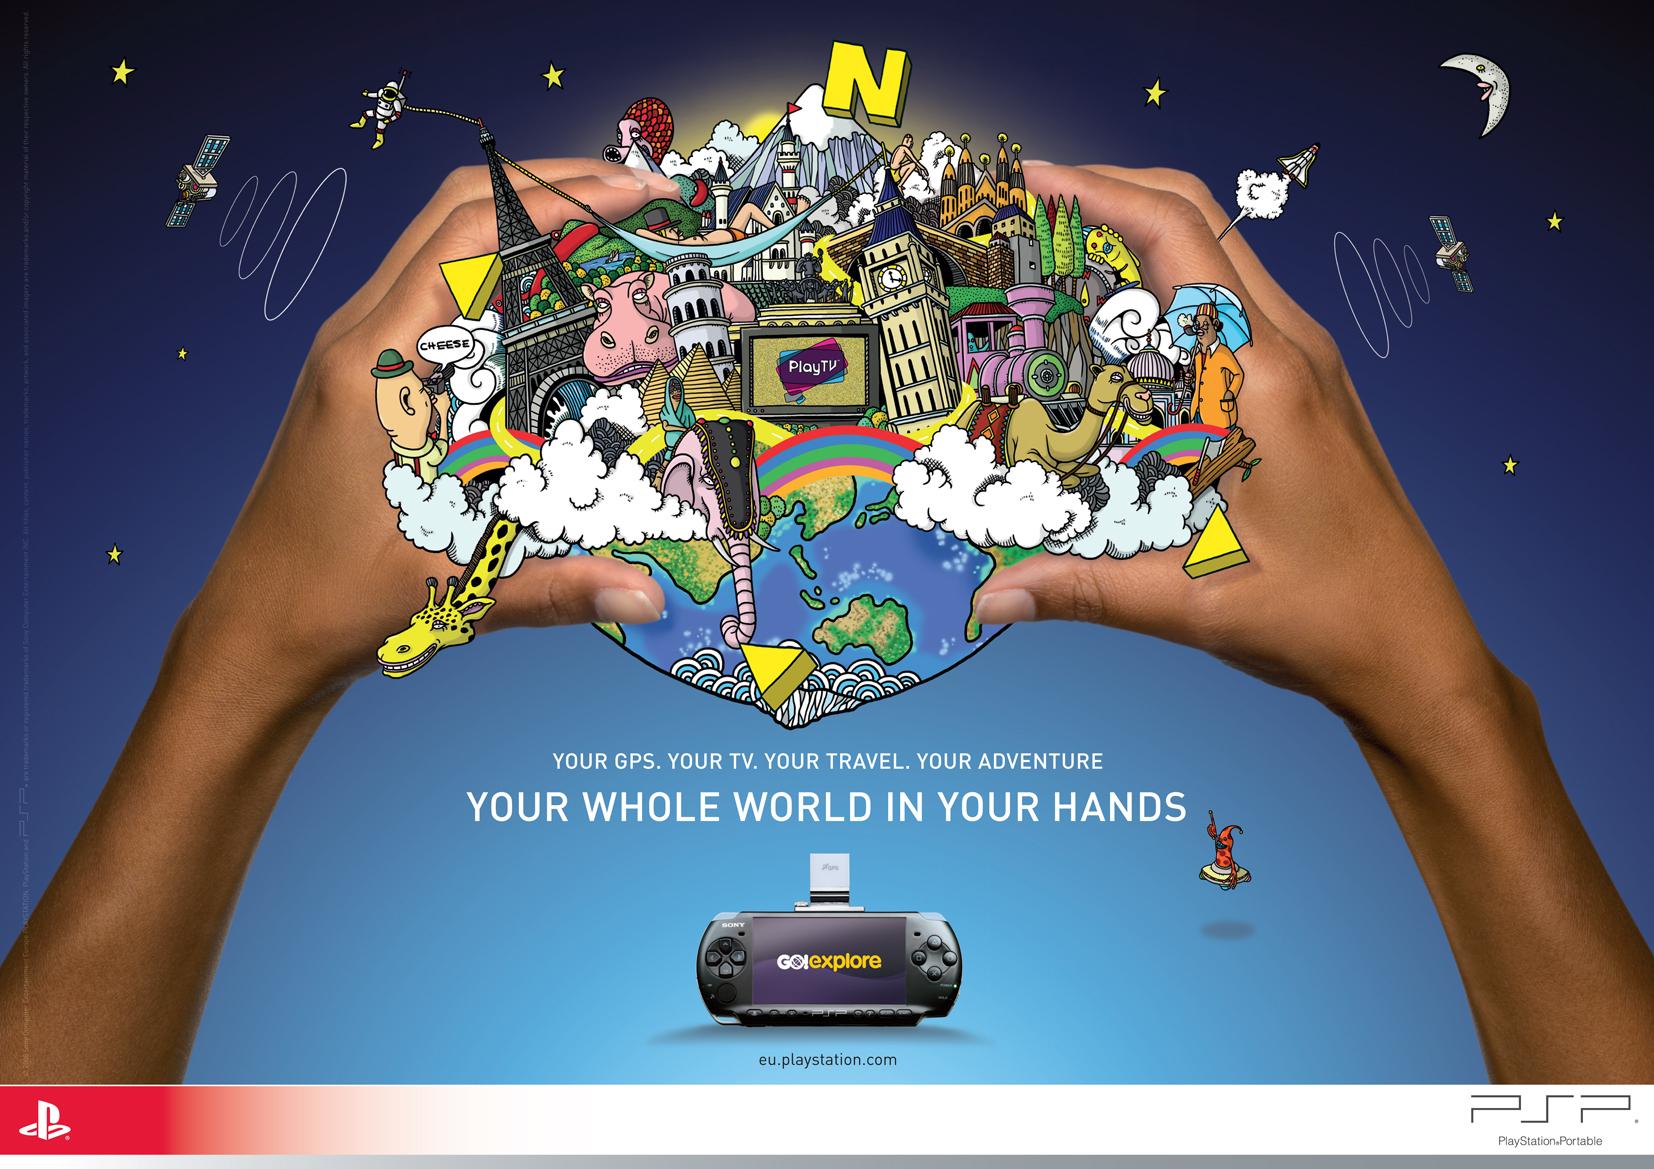 PSP Hands